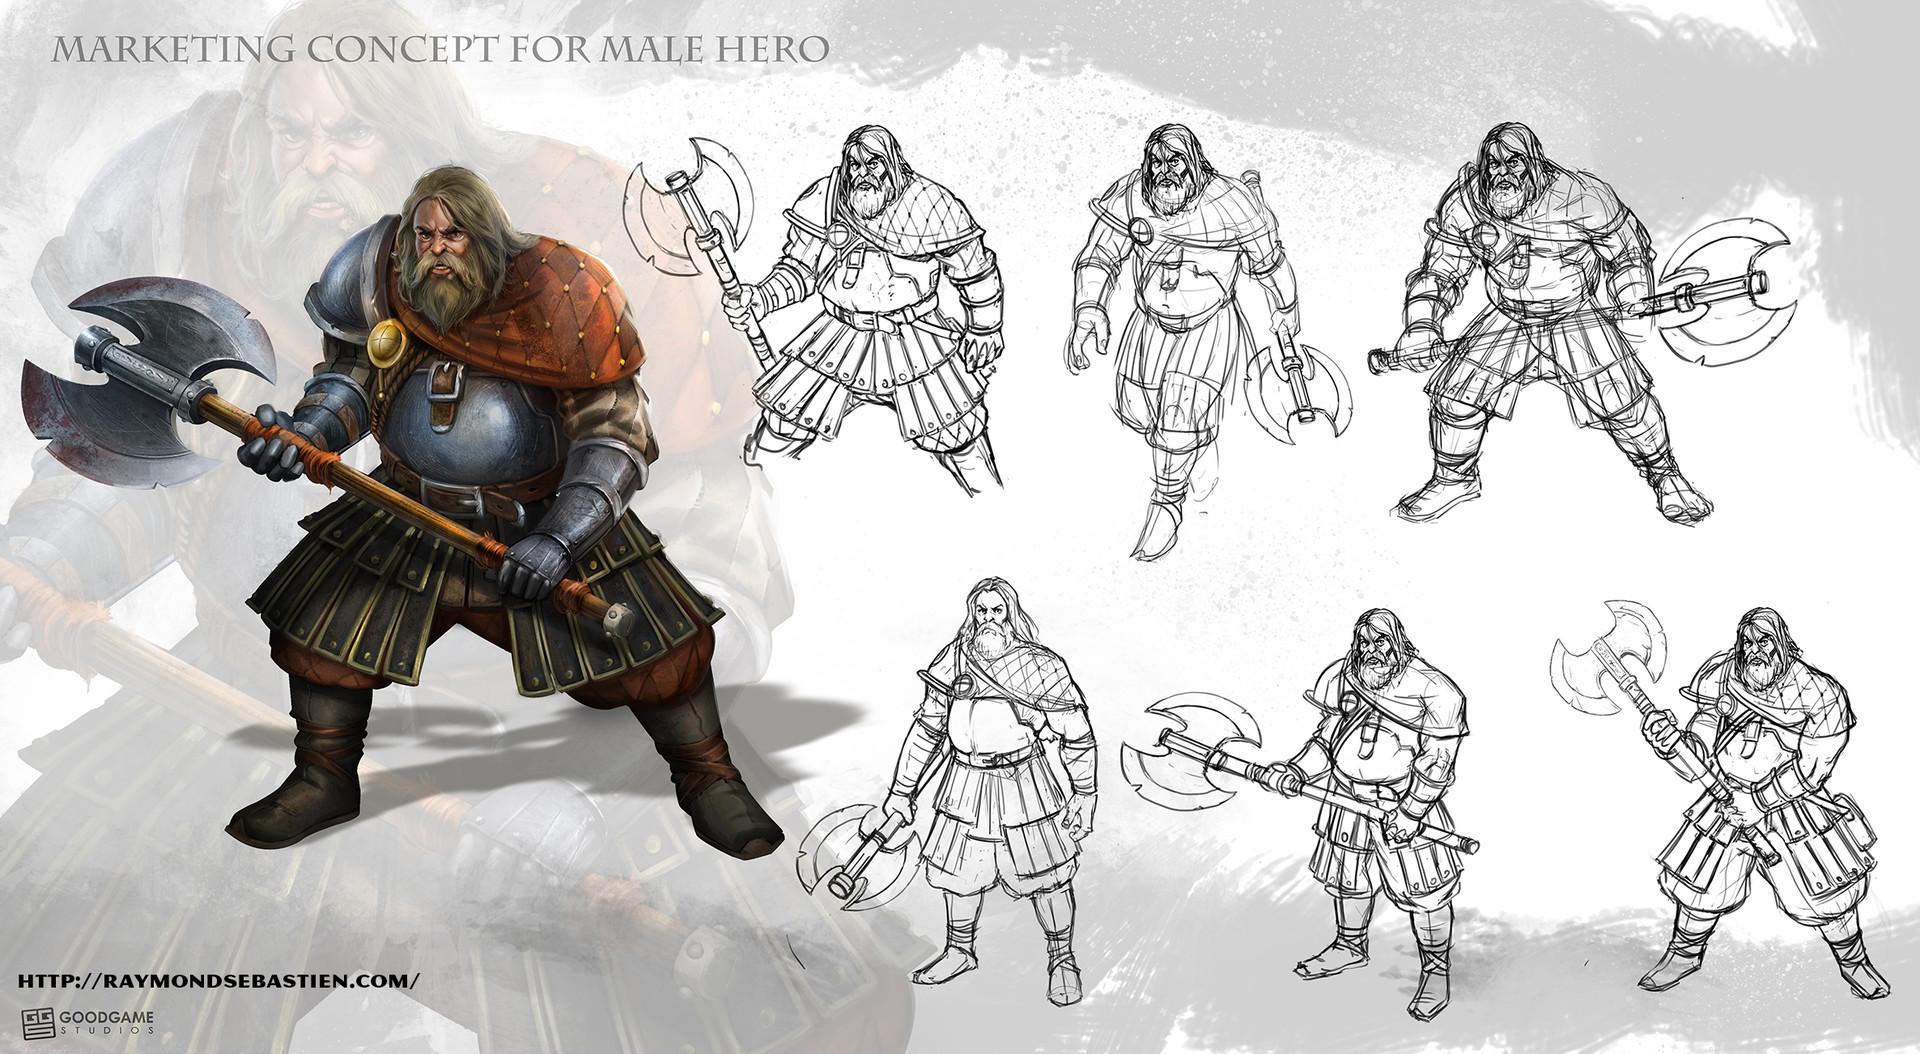 Raymond sebastien male hero 01 concept sheet by messiah972 d9xb9s6